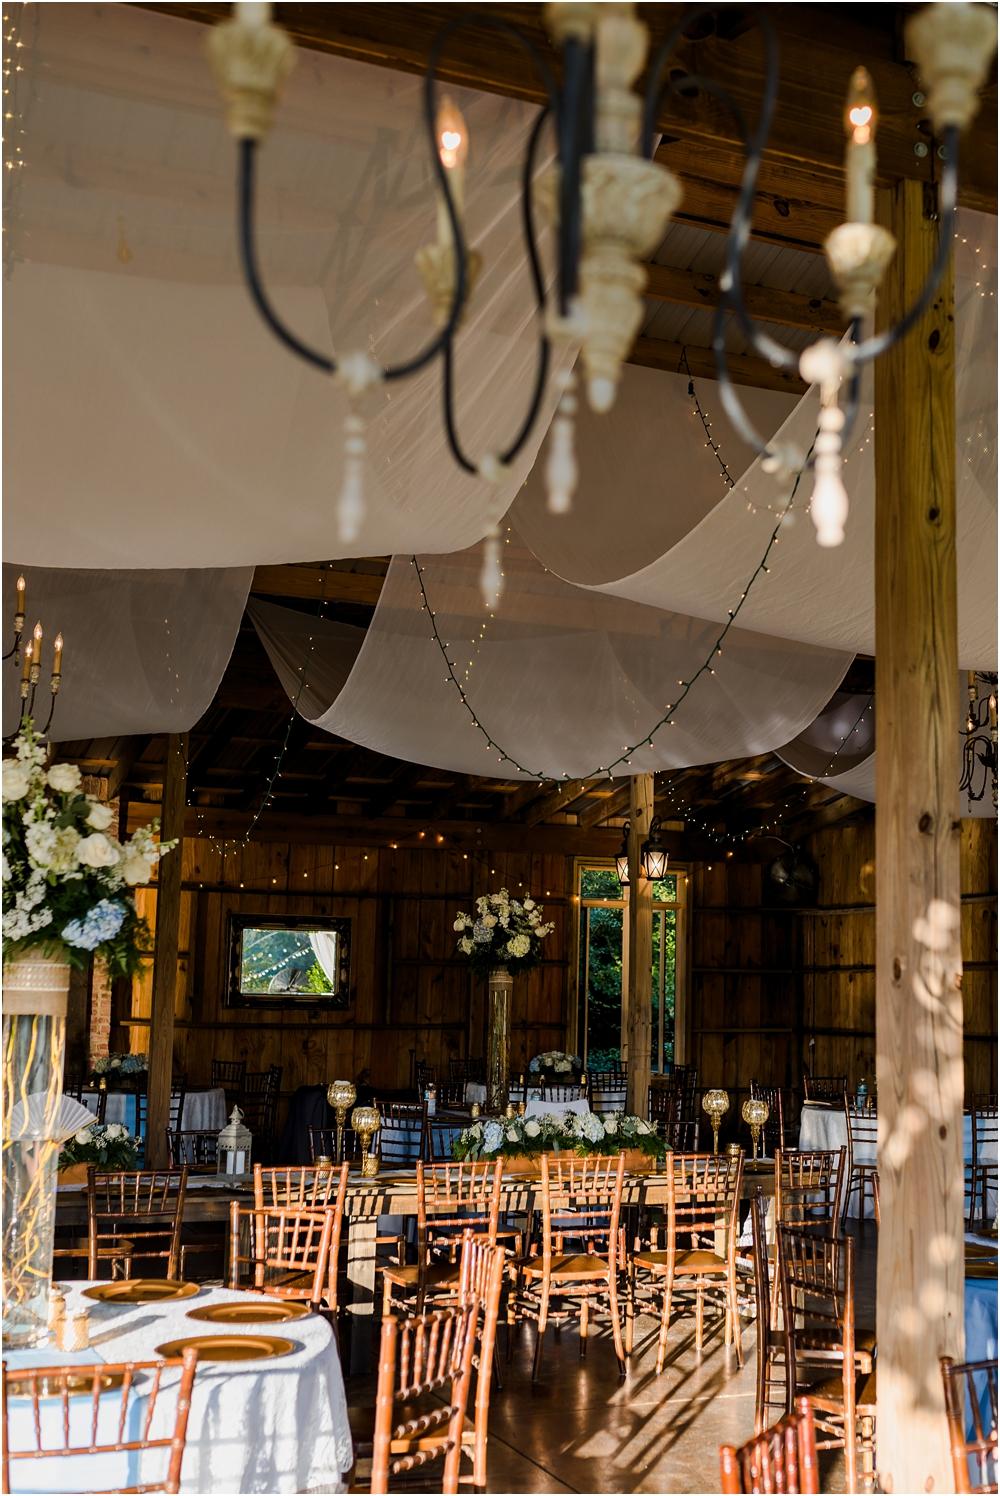 matthew-wedding-kiersten-stevenson-photography-30a-panama-city-beach-dothan-tallahassee-(279-of-579).JPG